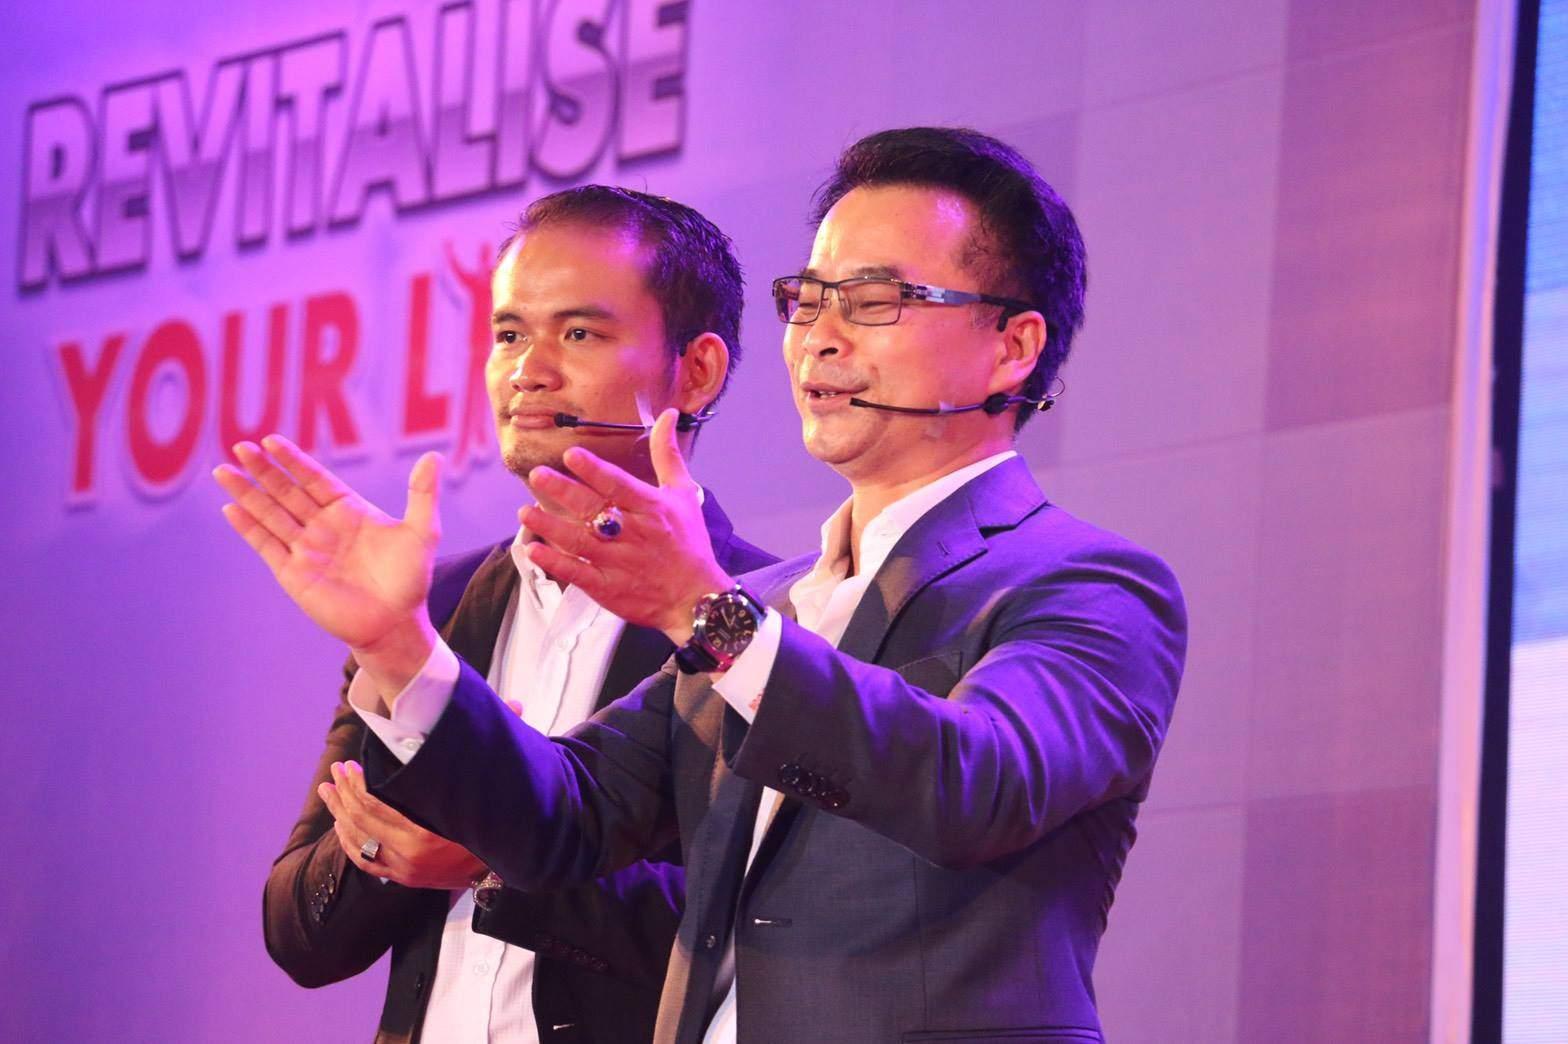 SUCCESSMORE Inspiration ครั้งที่ 17 เมืองย่างกุ้ง ประเทศเมียนมาร์ (3)